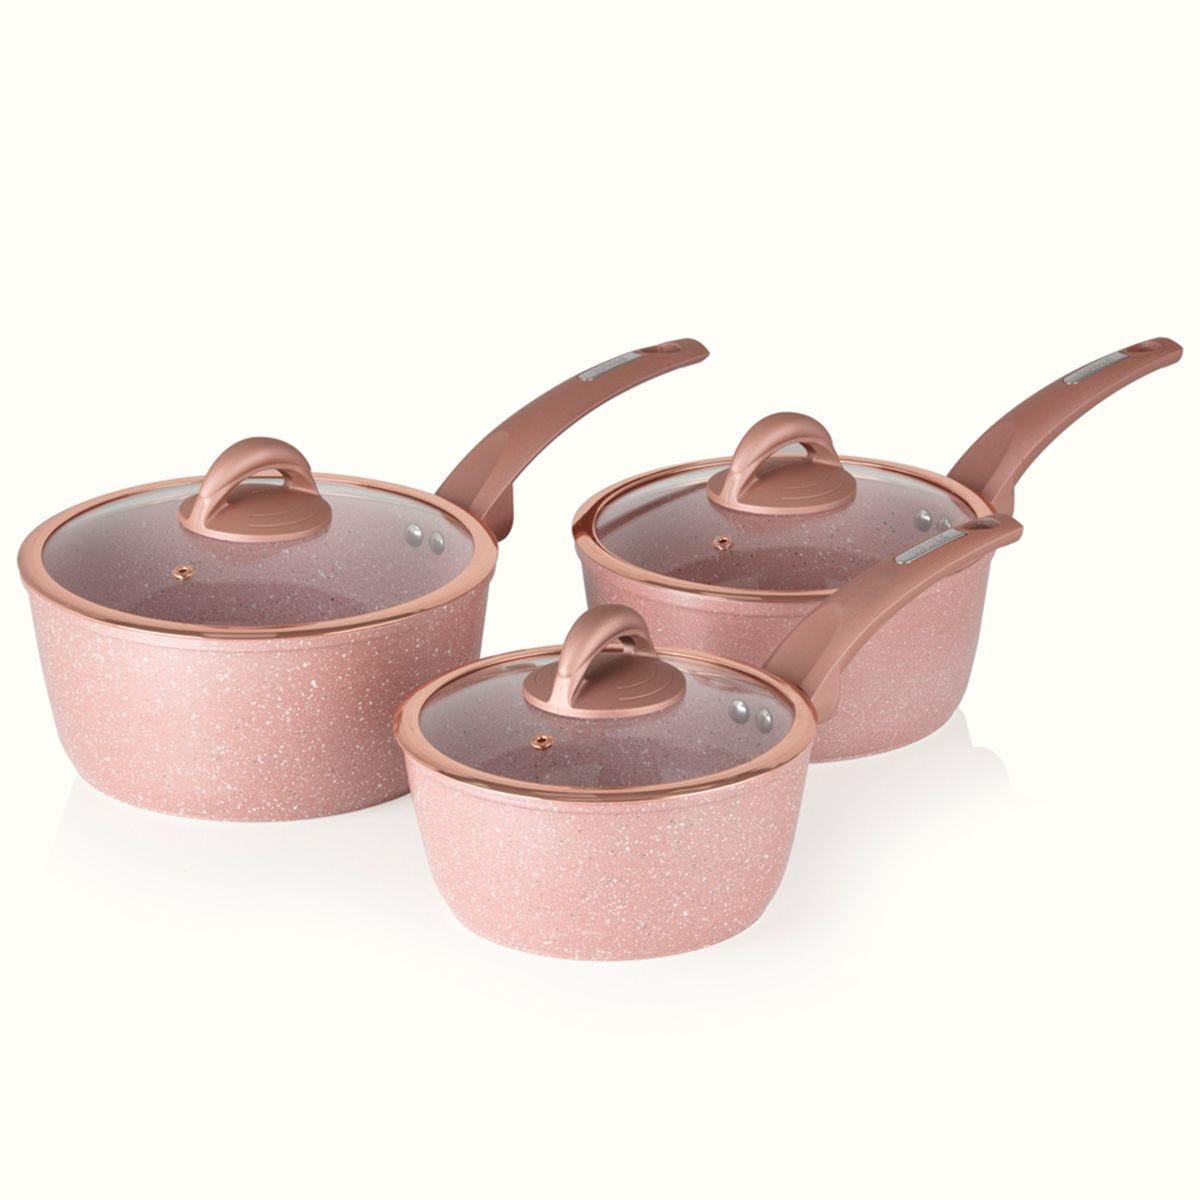 Tower Cerastone Forged 3 Piece Saucepans - Rose Pink